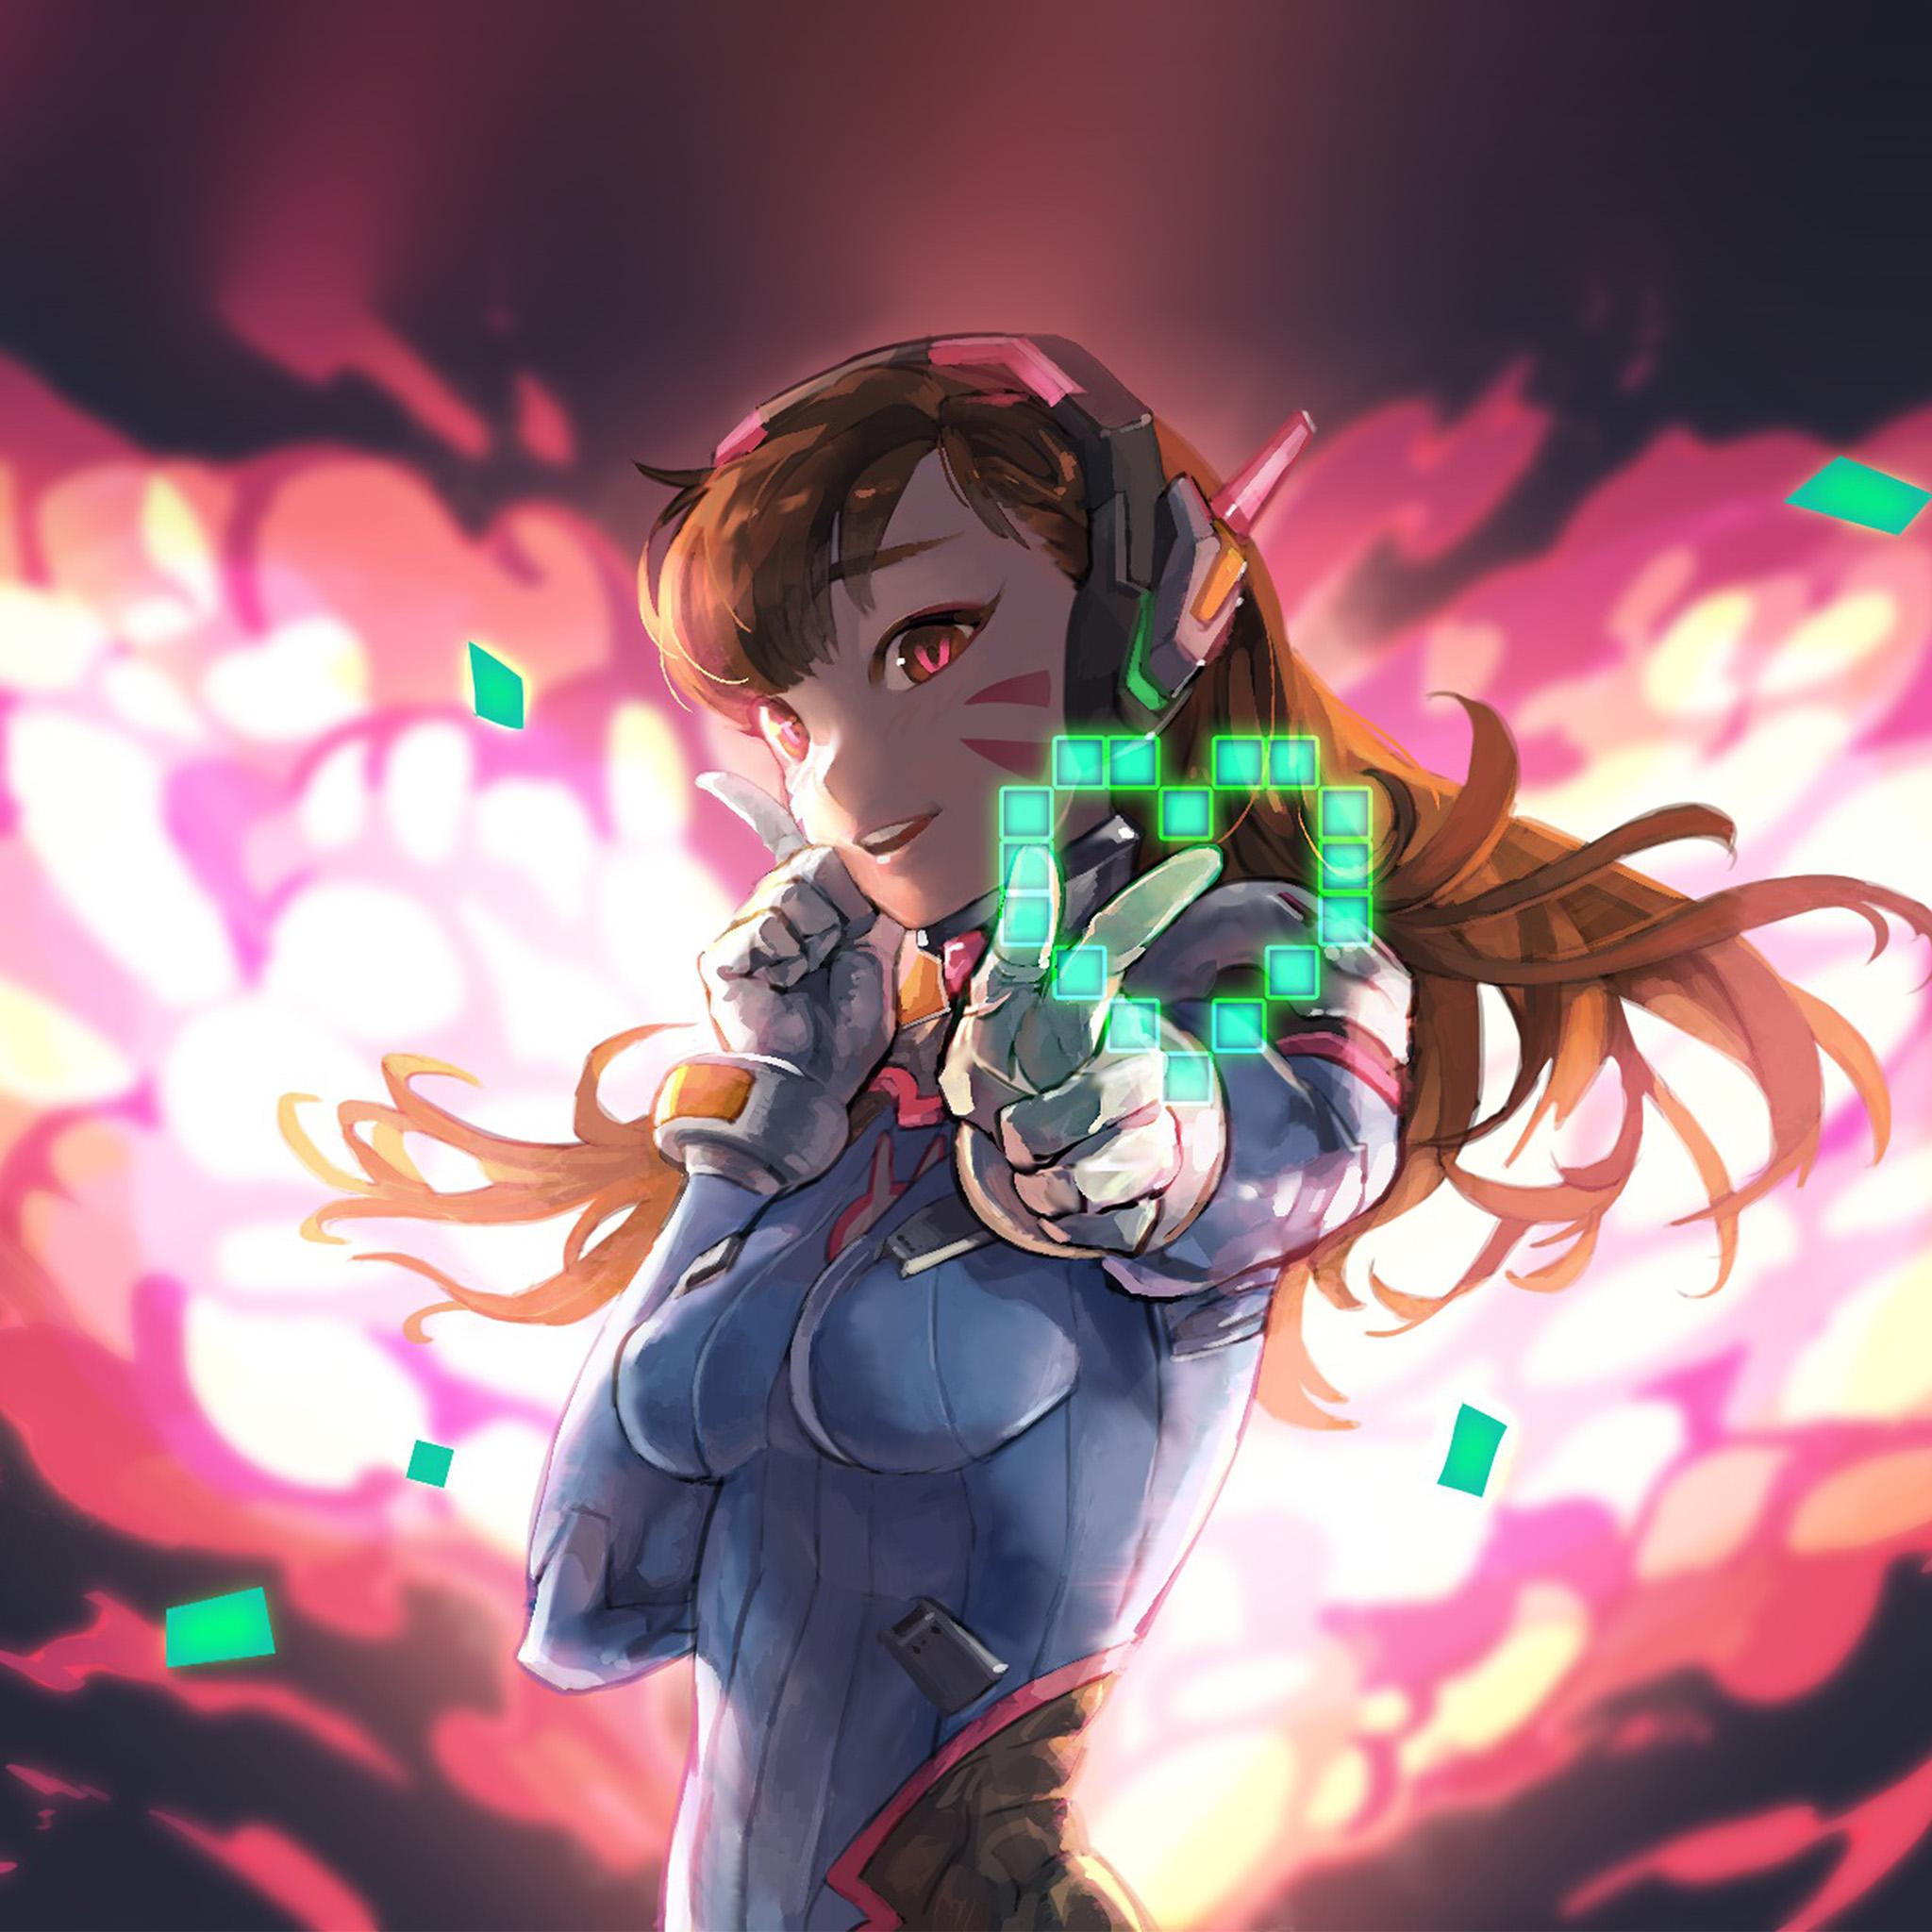 Cute Tomboy Wallpaper Bc70 Diva Girl Anime Game Overwatch Art Illustration Wallpaper